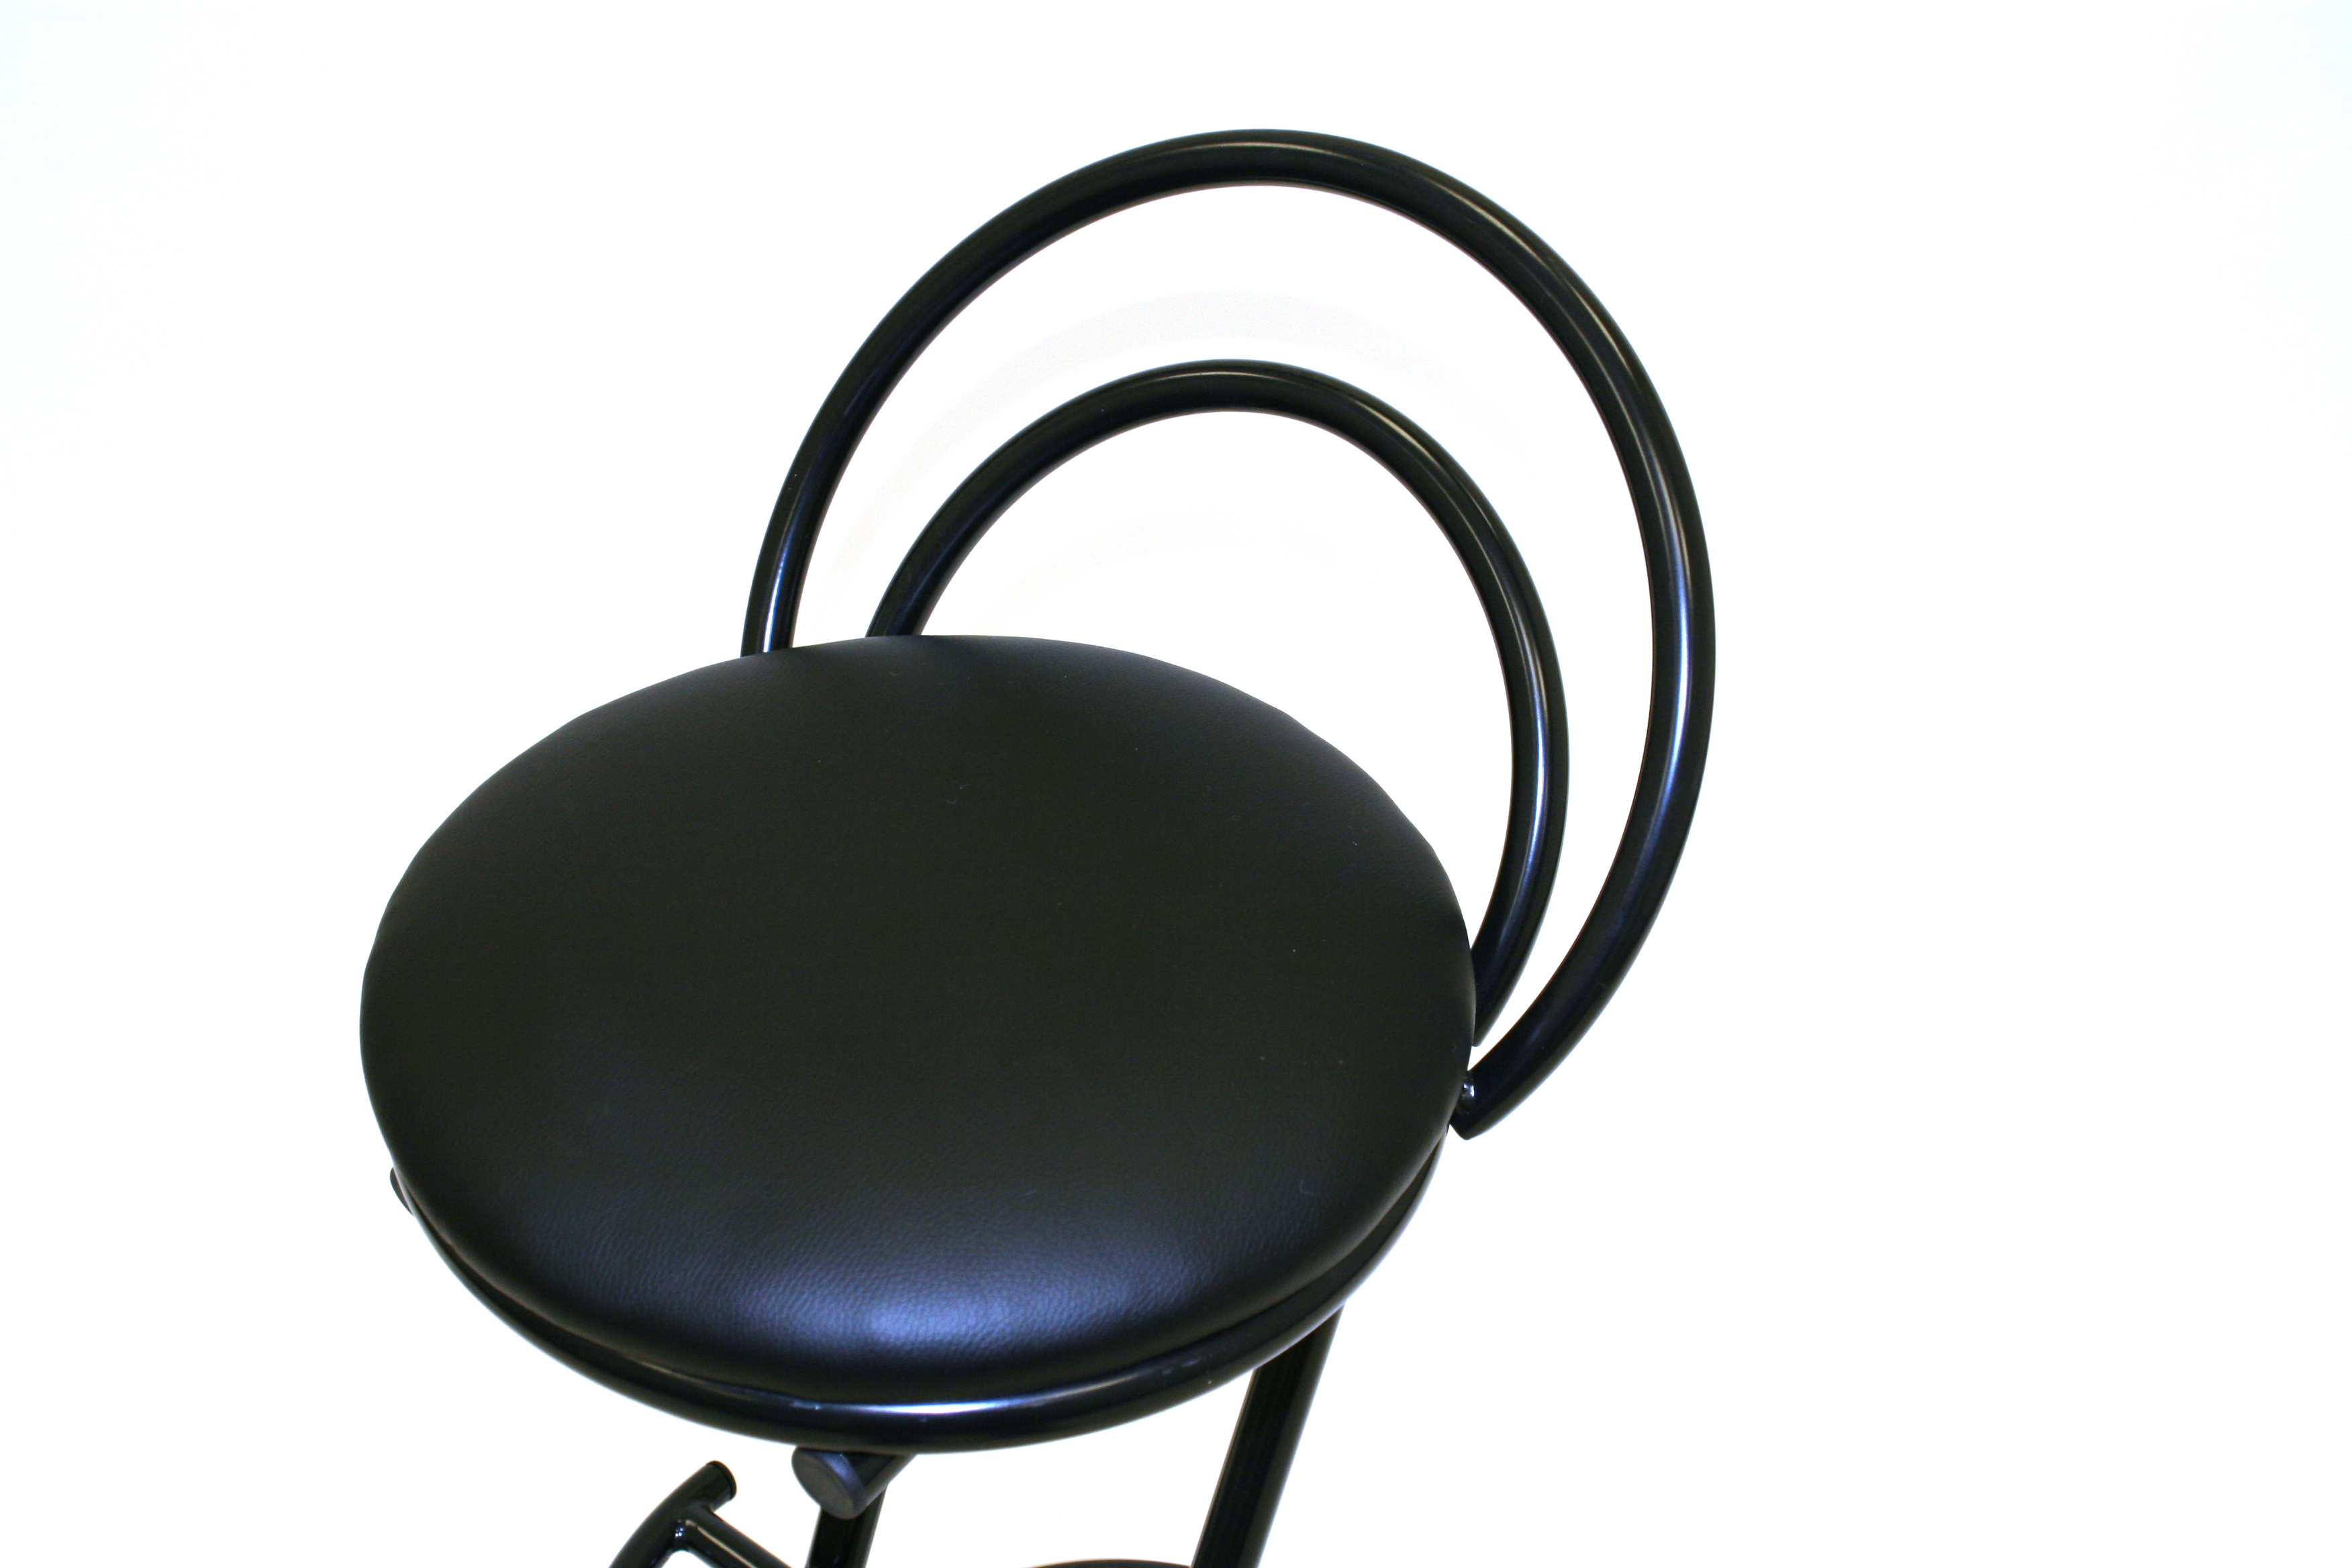 Black cobra bar stools with a black metal frame - BE Event Hire